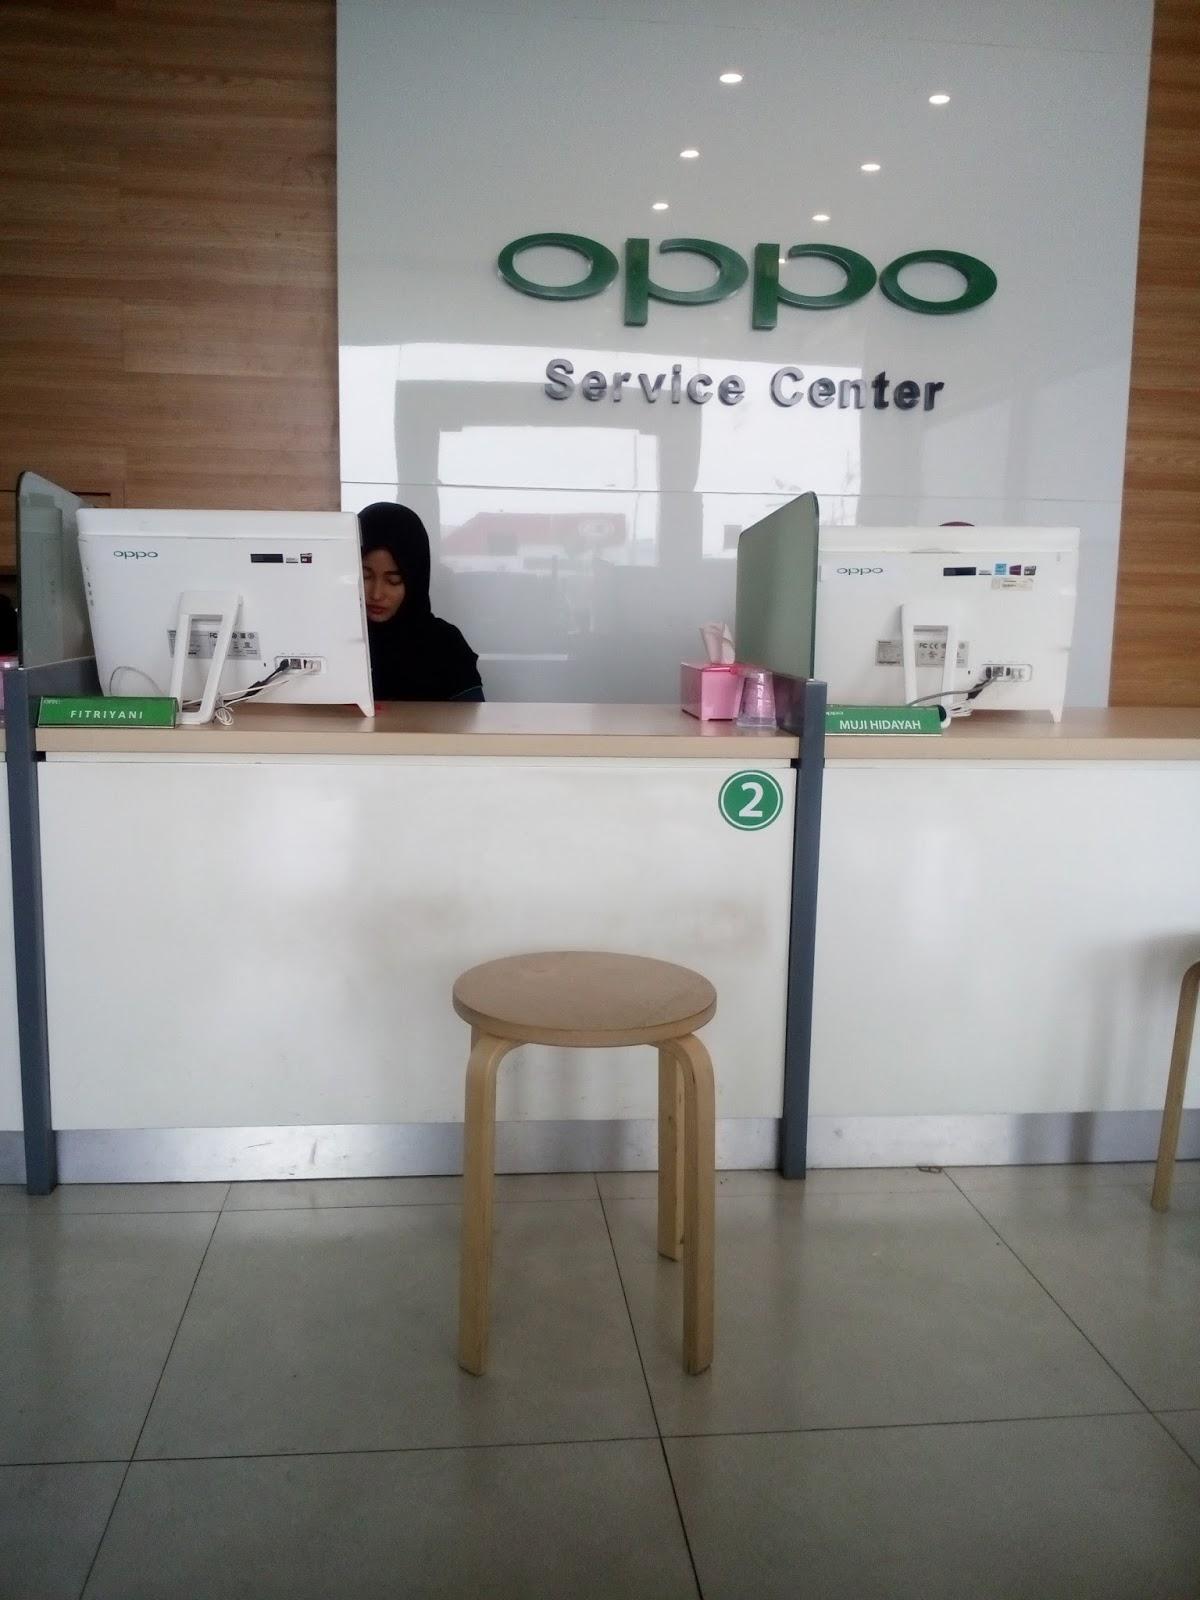 SKFight うまい Blog: Pengalaman ke Service Center OPPO di